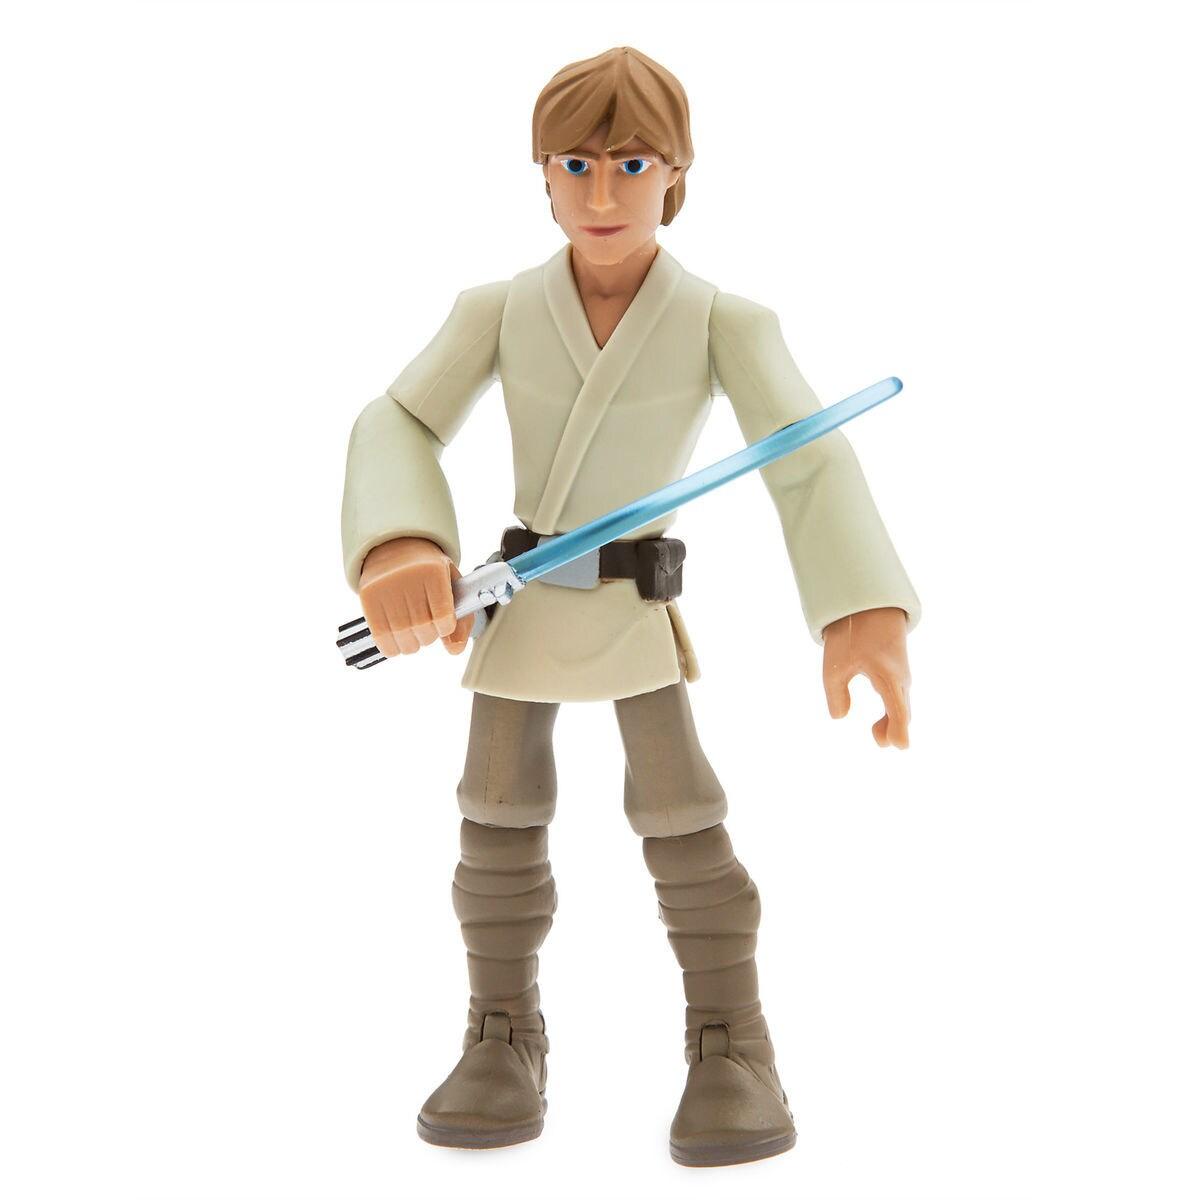 luke skywalker action figure star wars toybox shopdisney